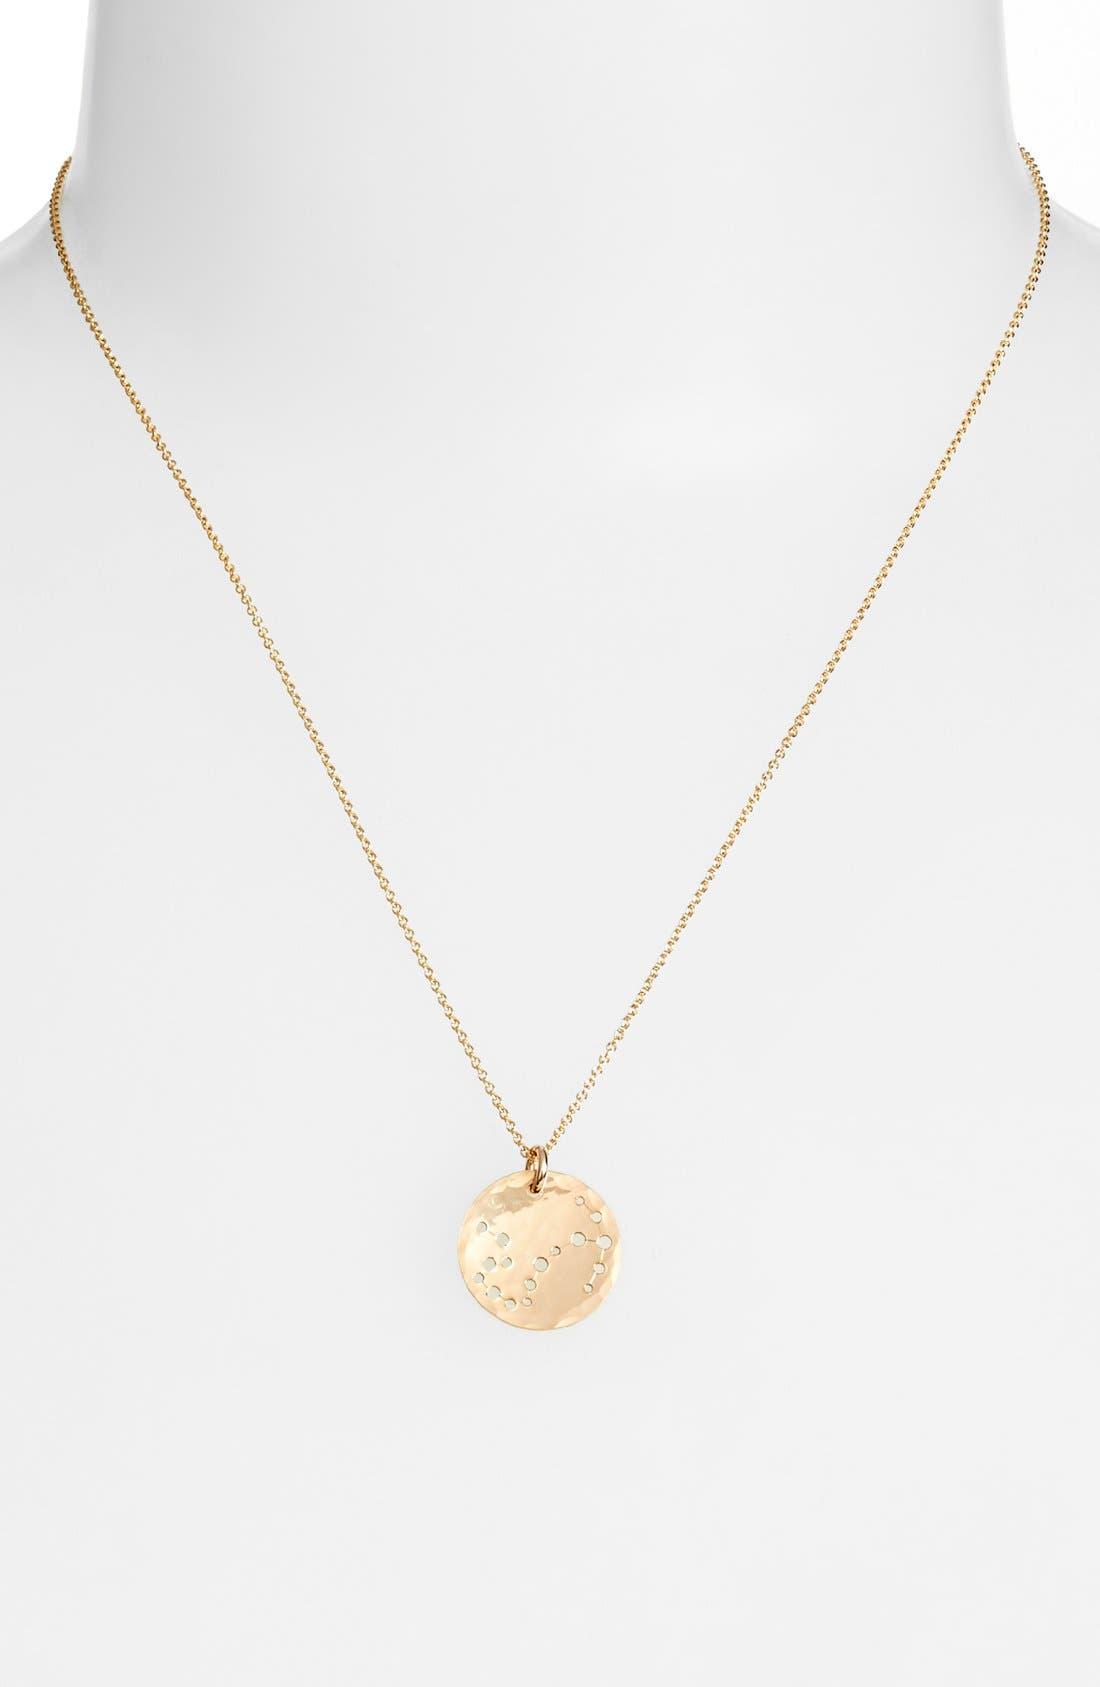 Ija 'Small Zodiac' 14k-Gold Fill Necklace,                             Alternate thumbnail 20, color,